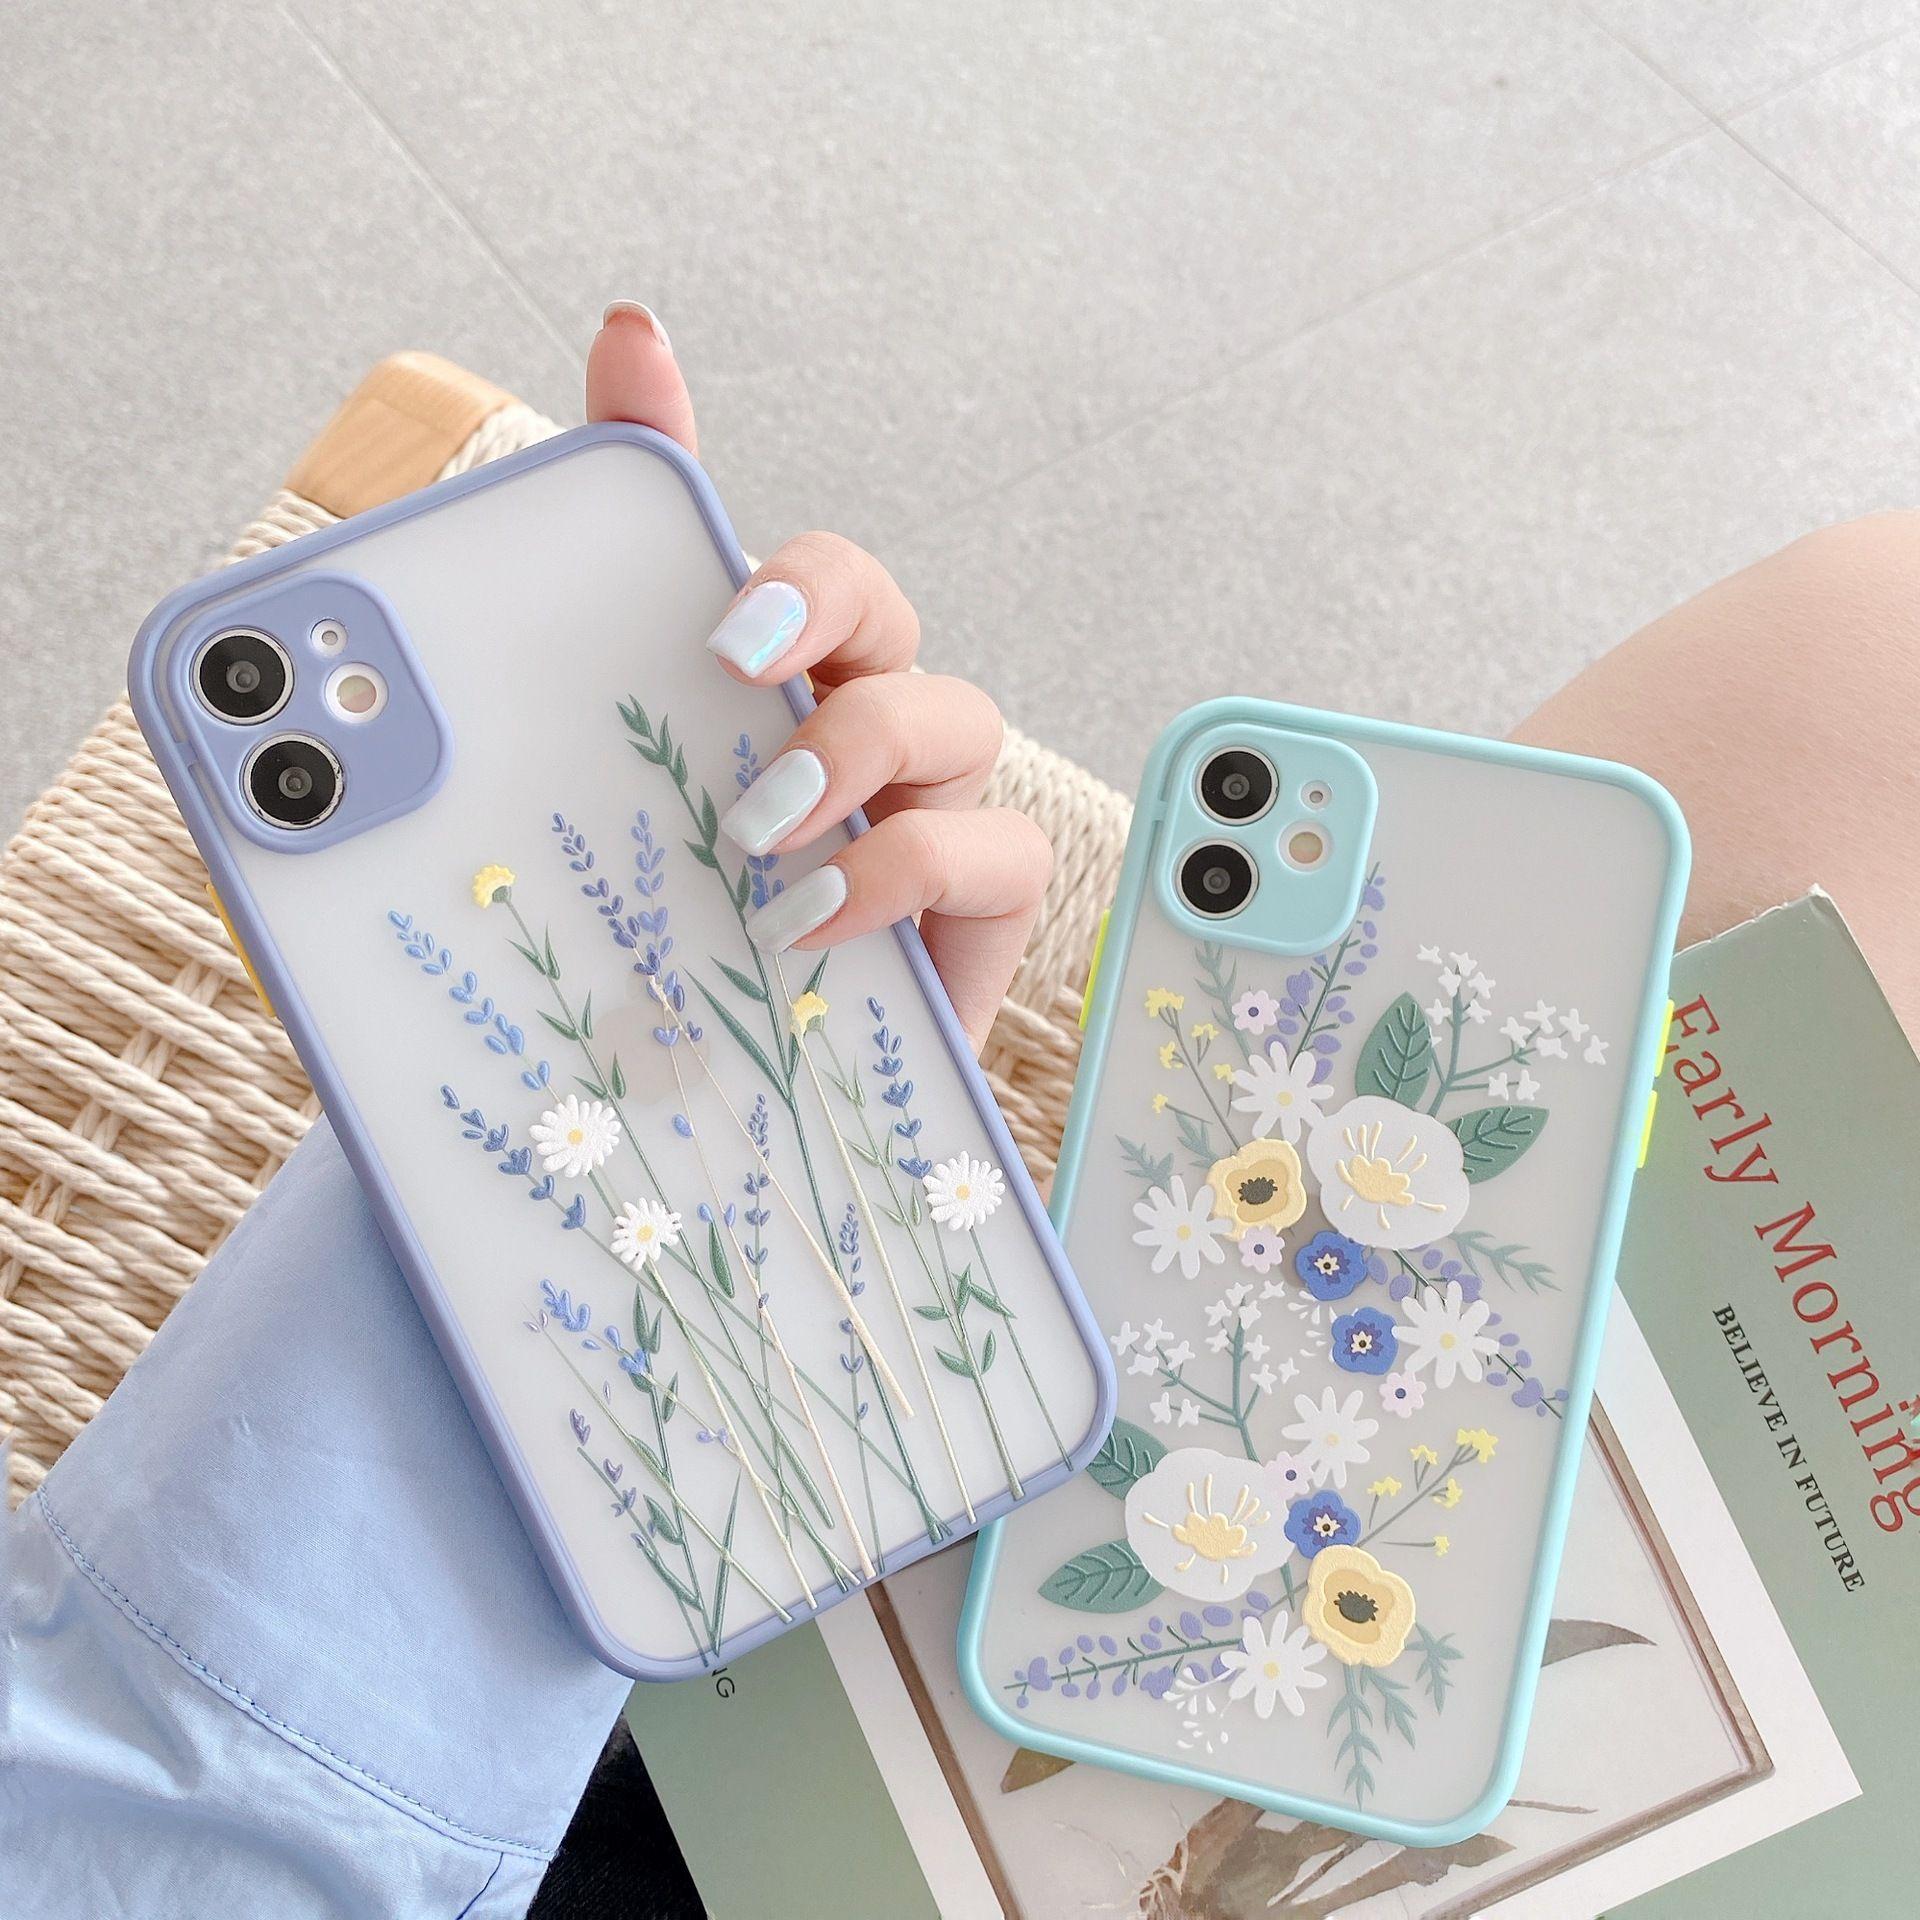 Luxus 3D Relief Blume Fall für iPhone 12 Mini 11 Pro Max x XR xs 7 8 Plus Weicher Stoßfänger Transparent Matte PC Back Cover